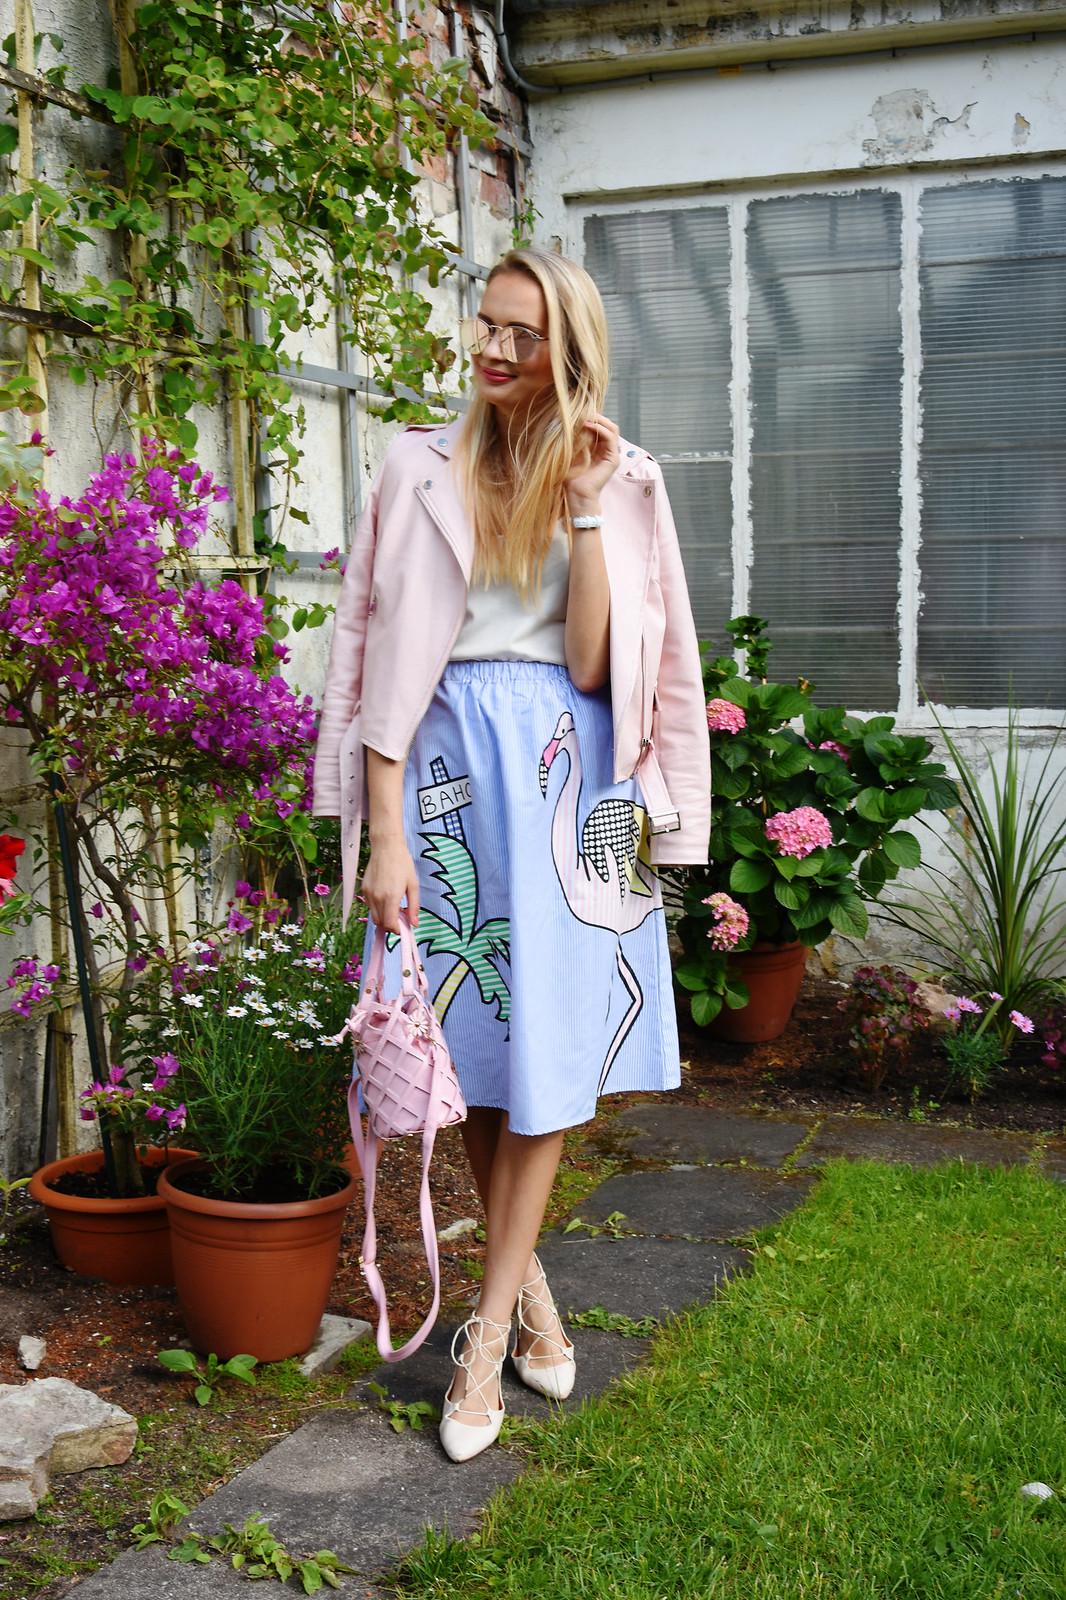 Fashion inspiration for summer